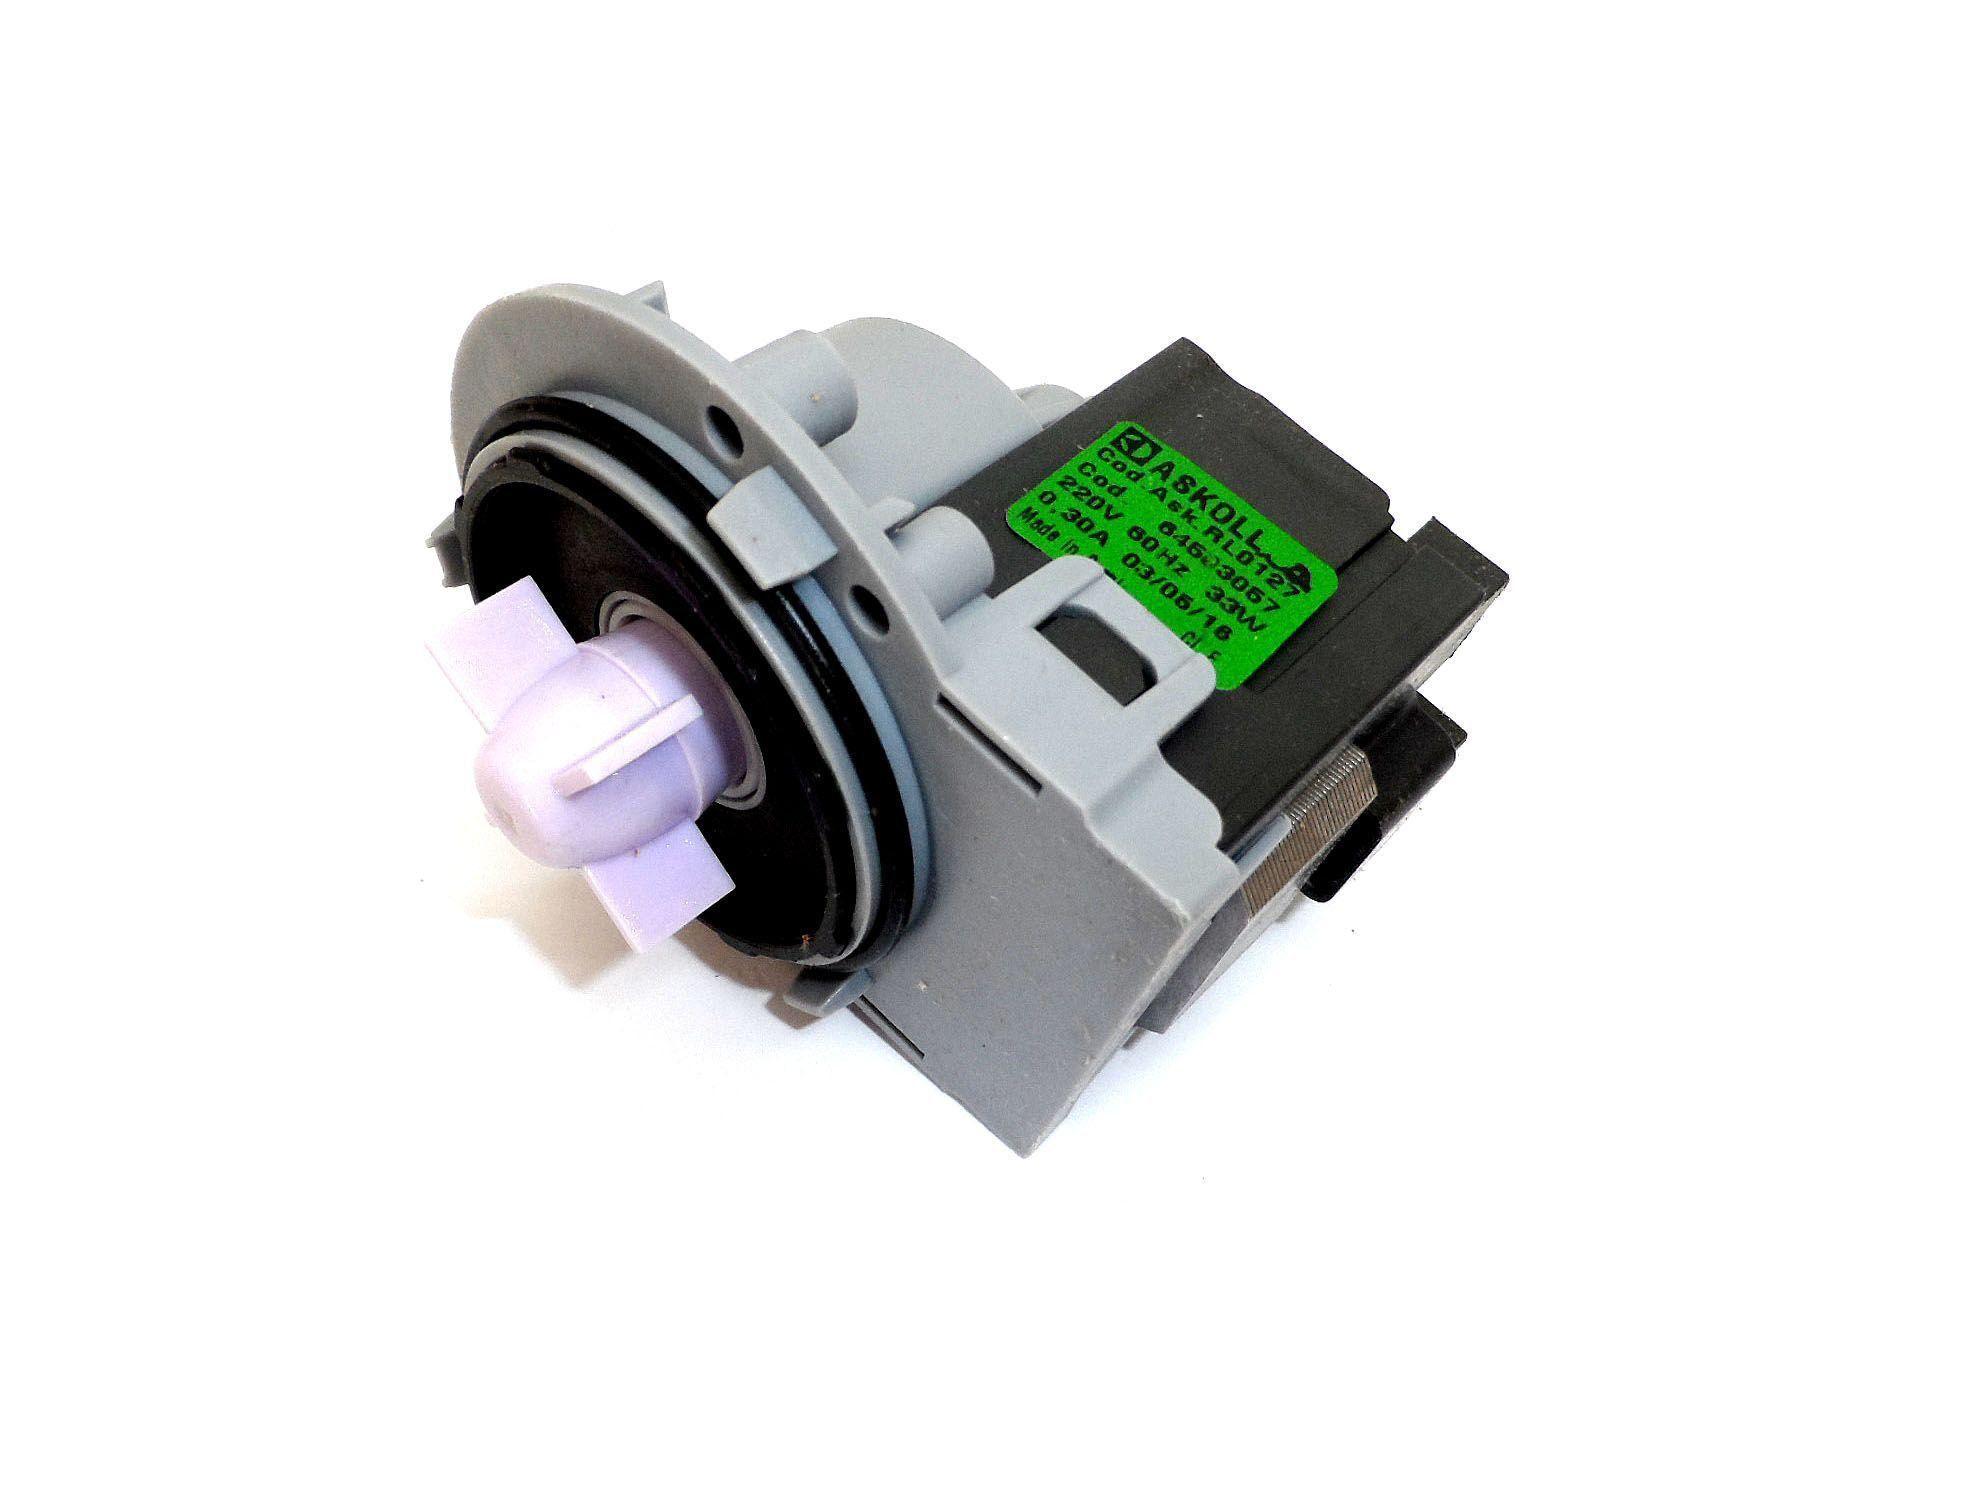 ELETROBOMBA DRENAGEM LAVADORA ELECTROLUX 220V 64503057